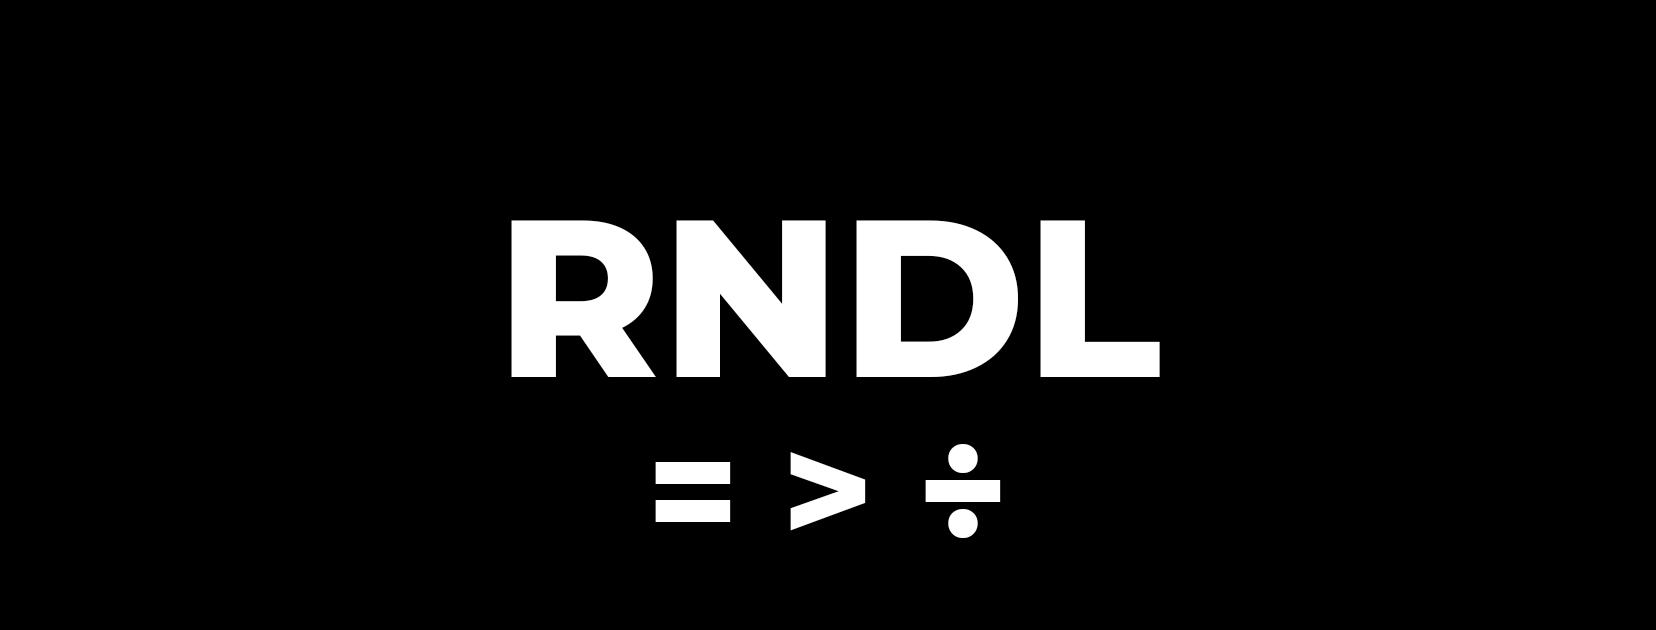 RNDL Logo